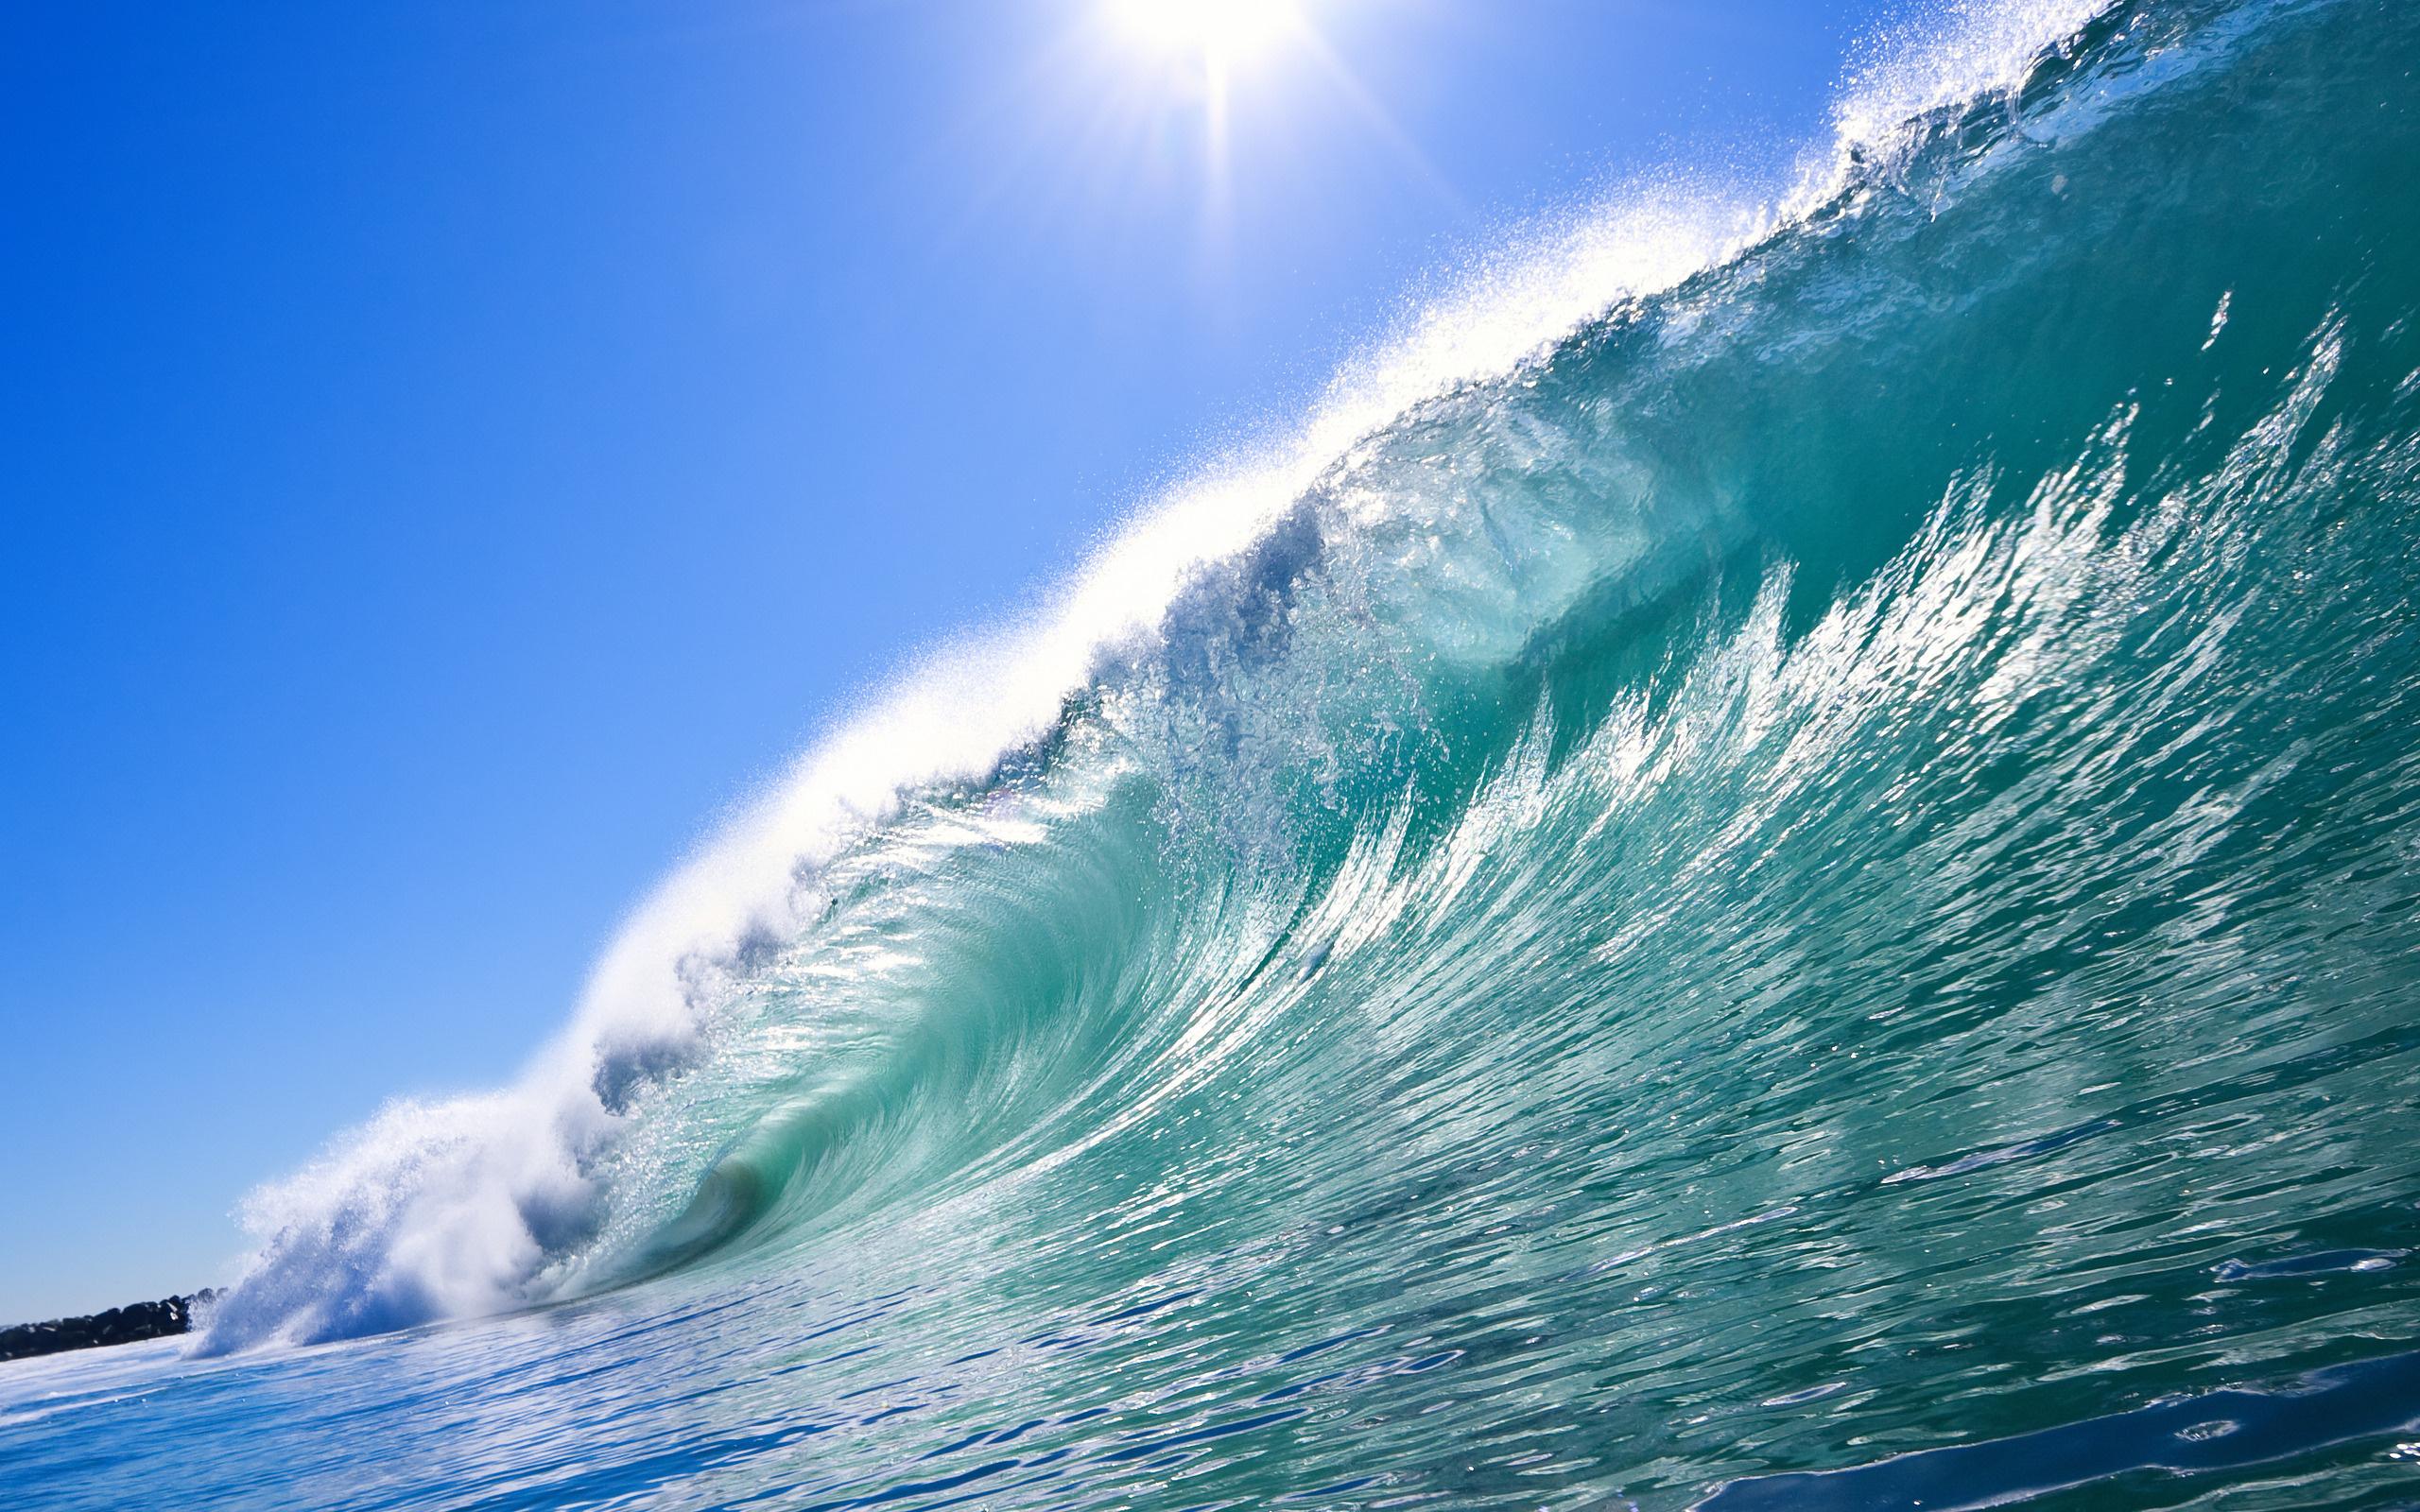 Wallpaper ocean wave spray desktop wallpaper Nature GoodWPcom 2560x1600